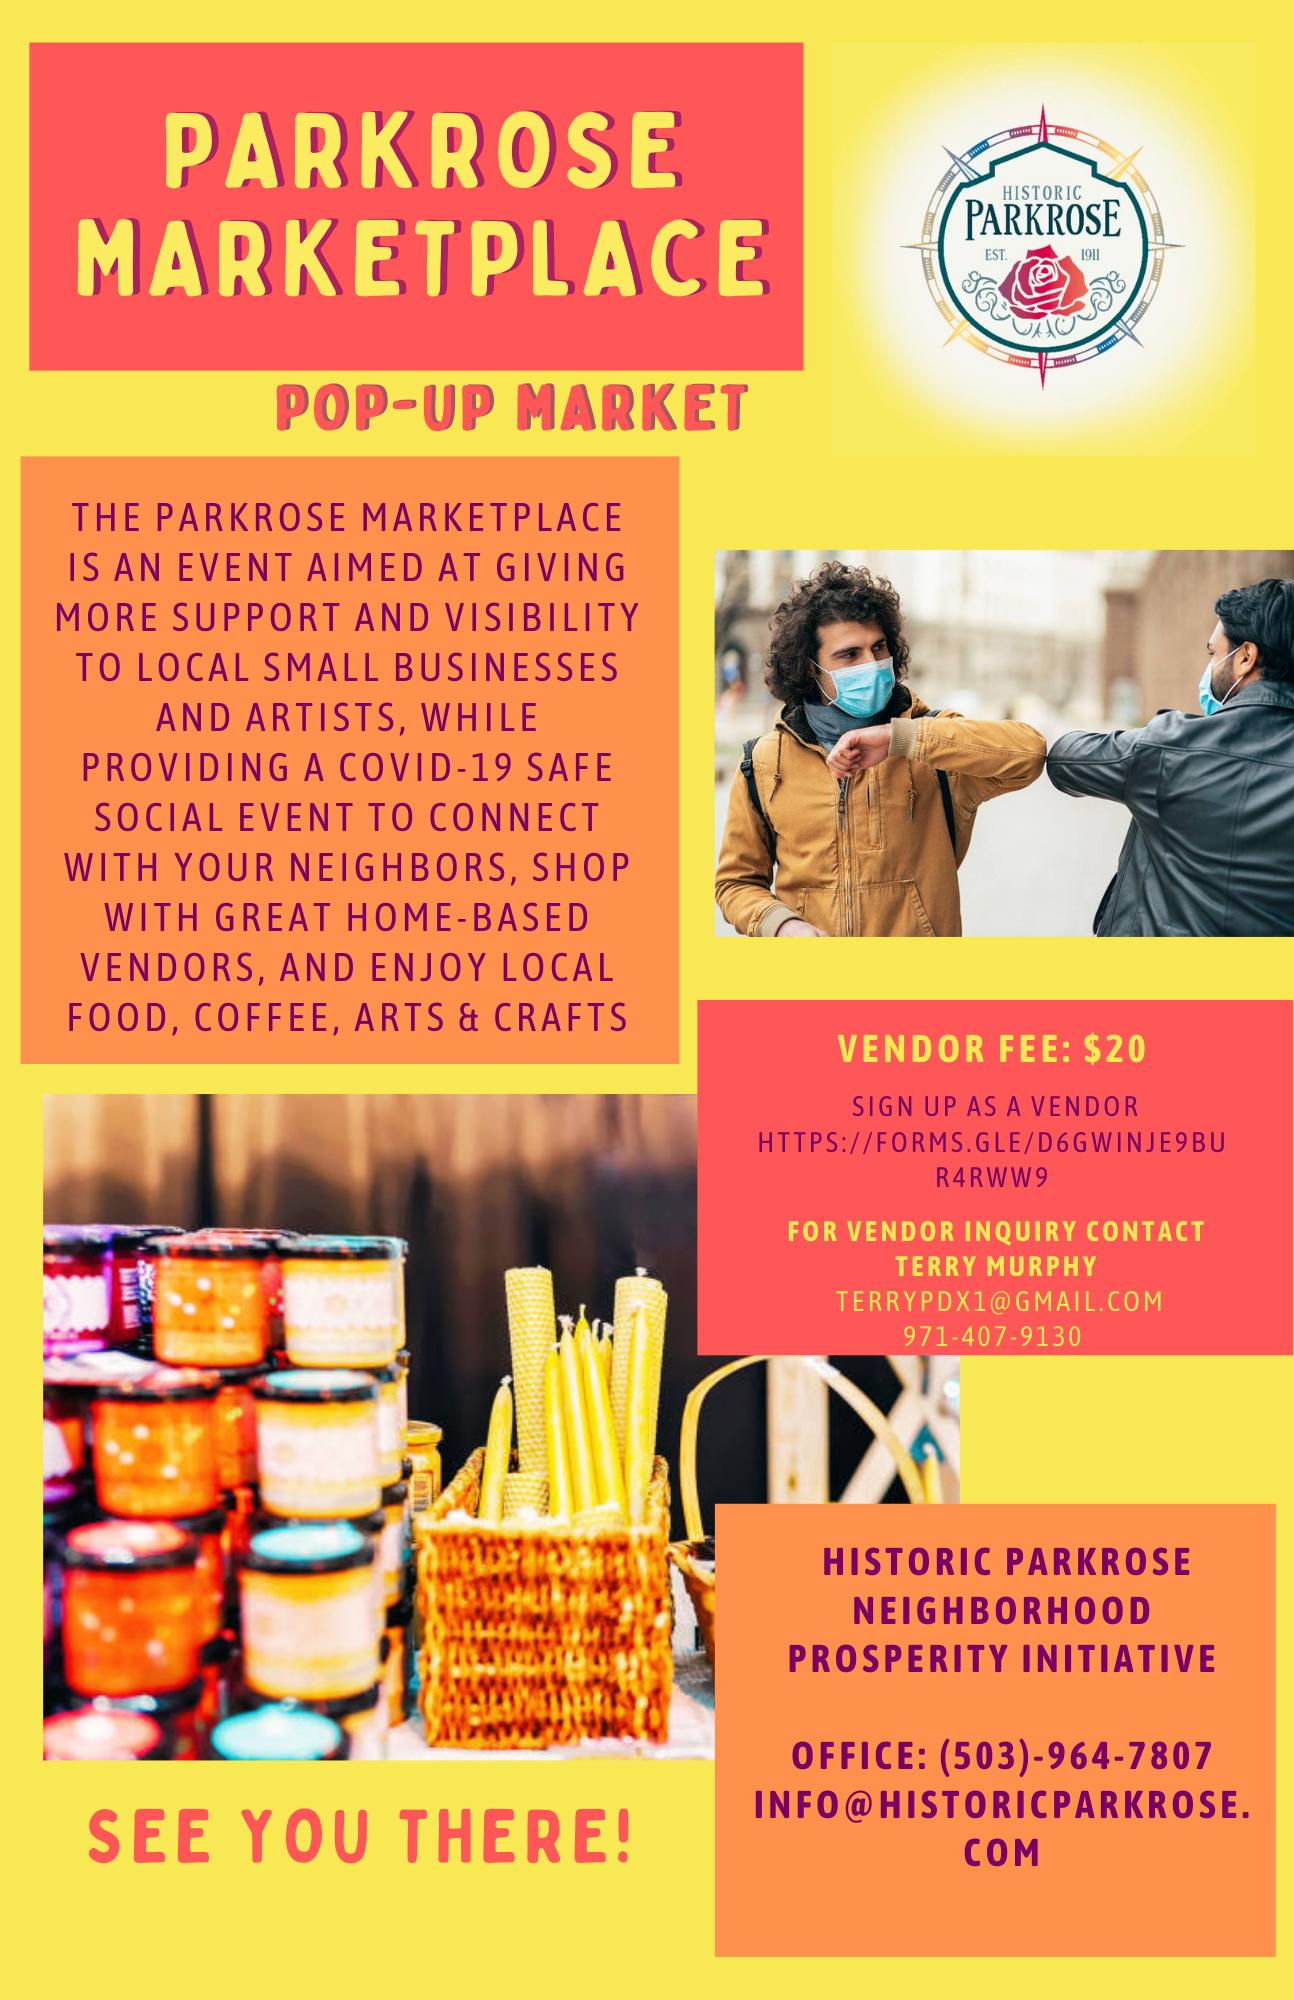 Parkrose Marketplace Monthly Pop-up Market Flyer